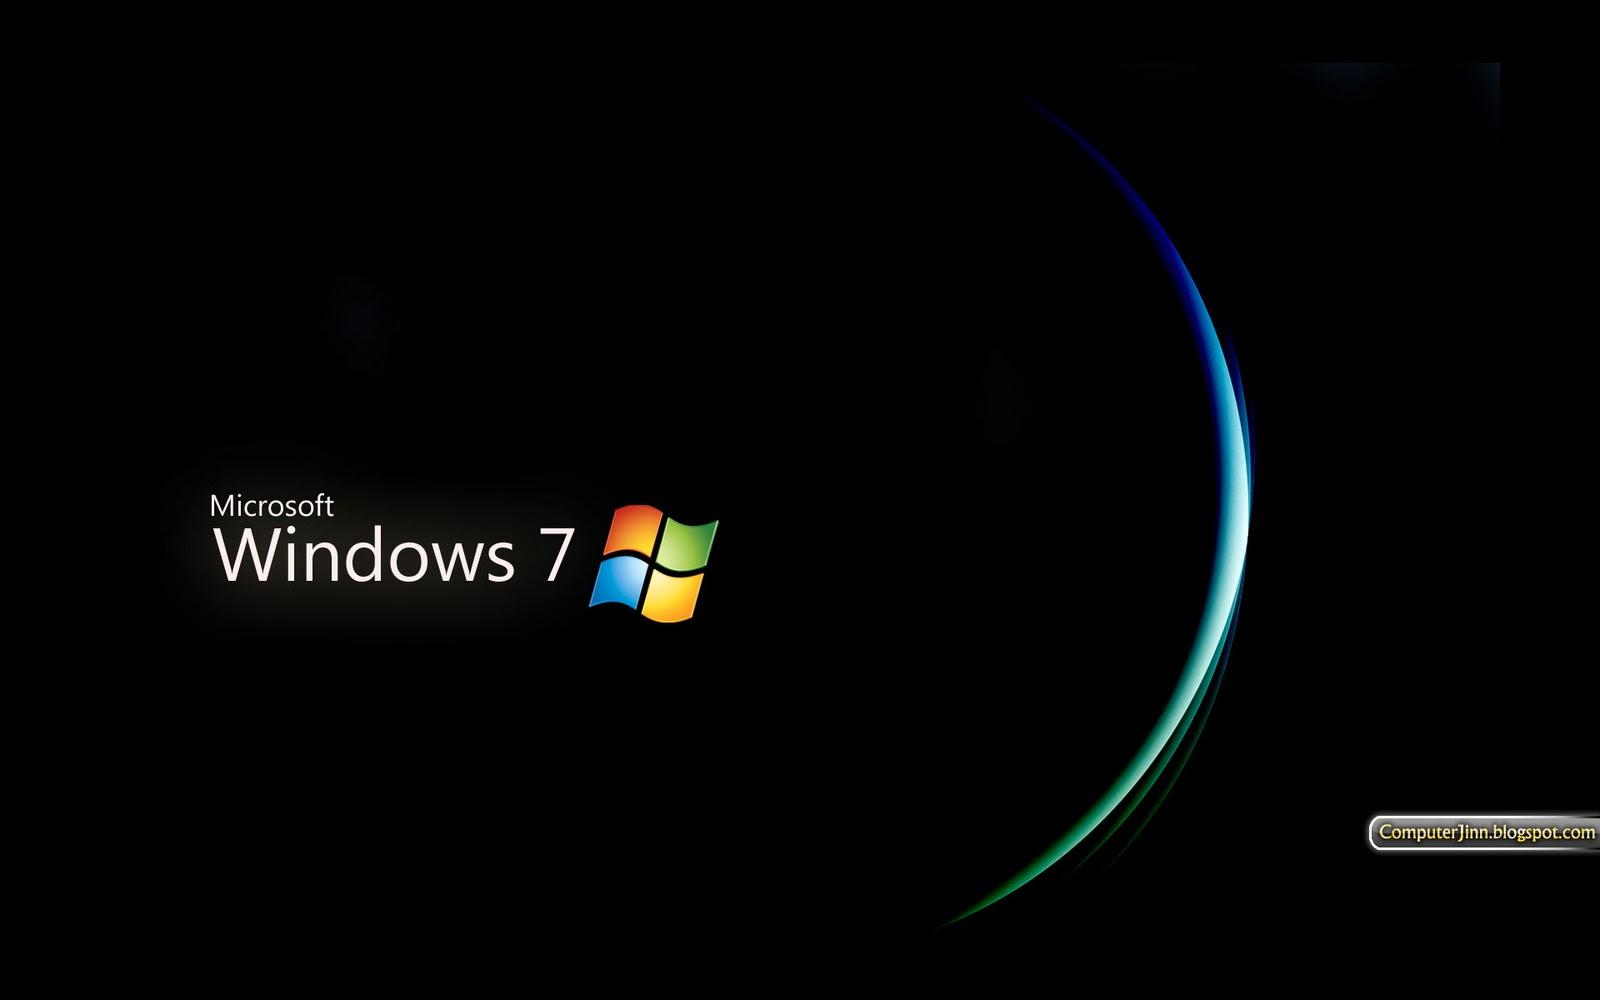 Windows Black Wallpaper 10 Free